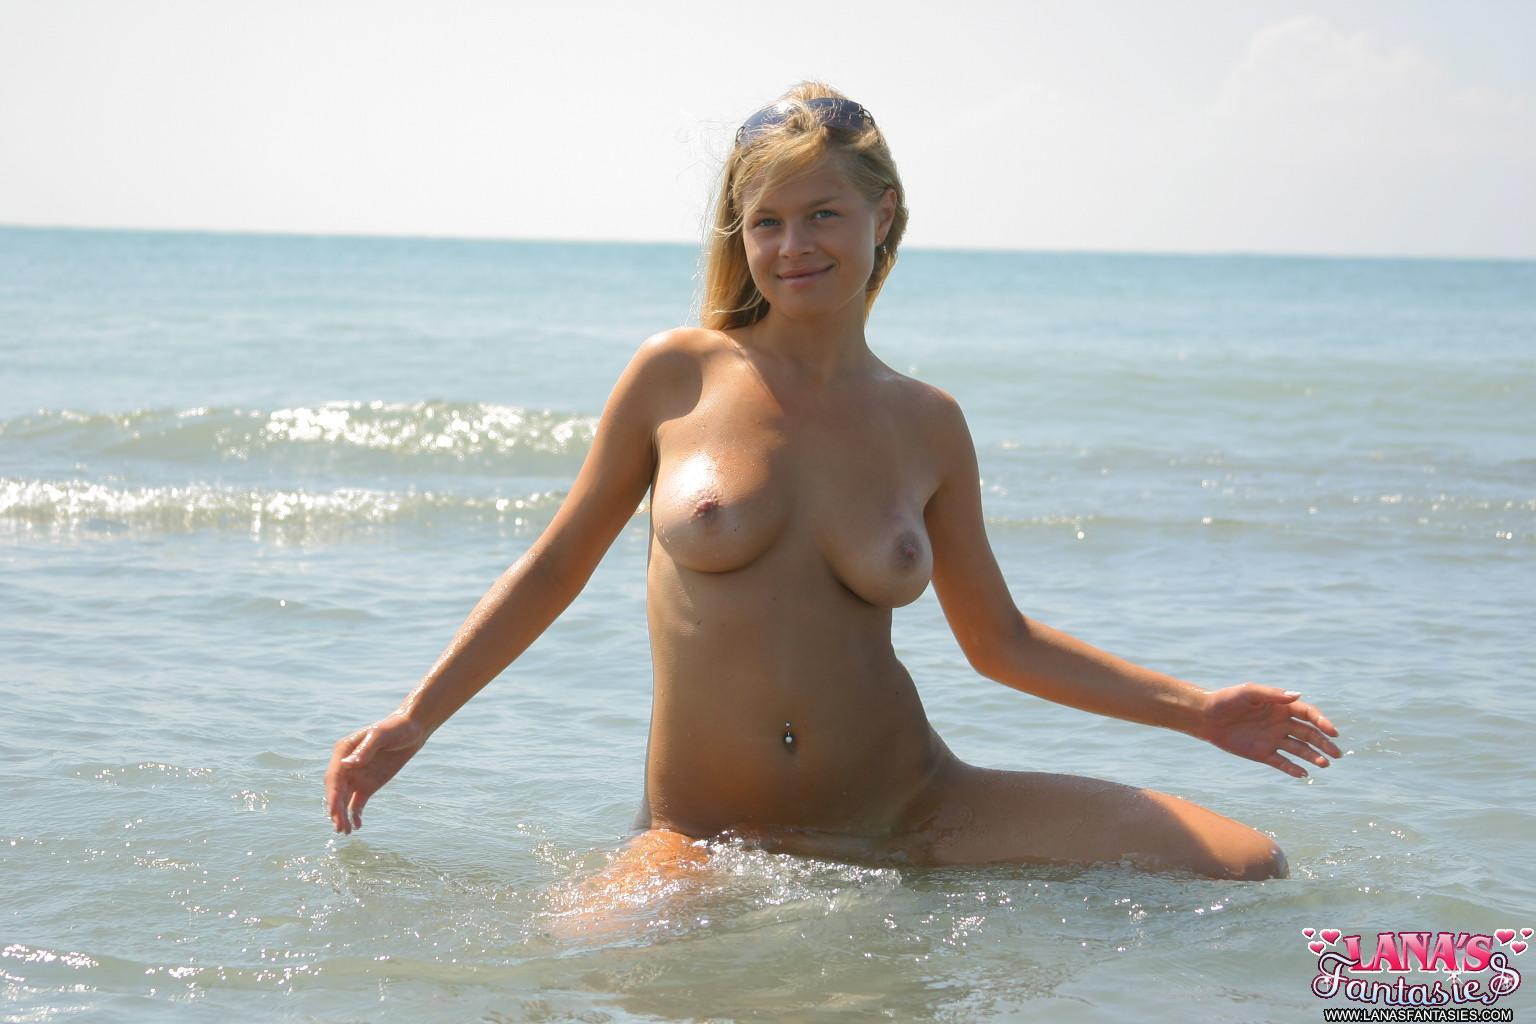 naked hot ckick gettin it